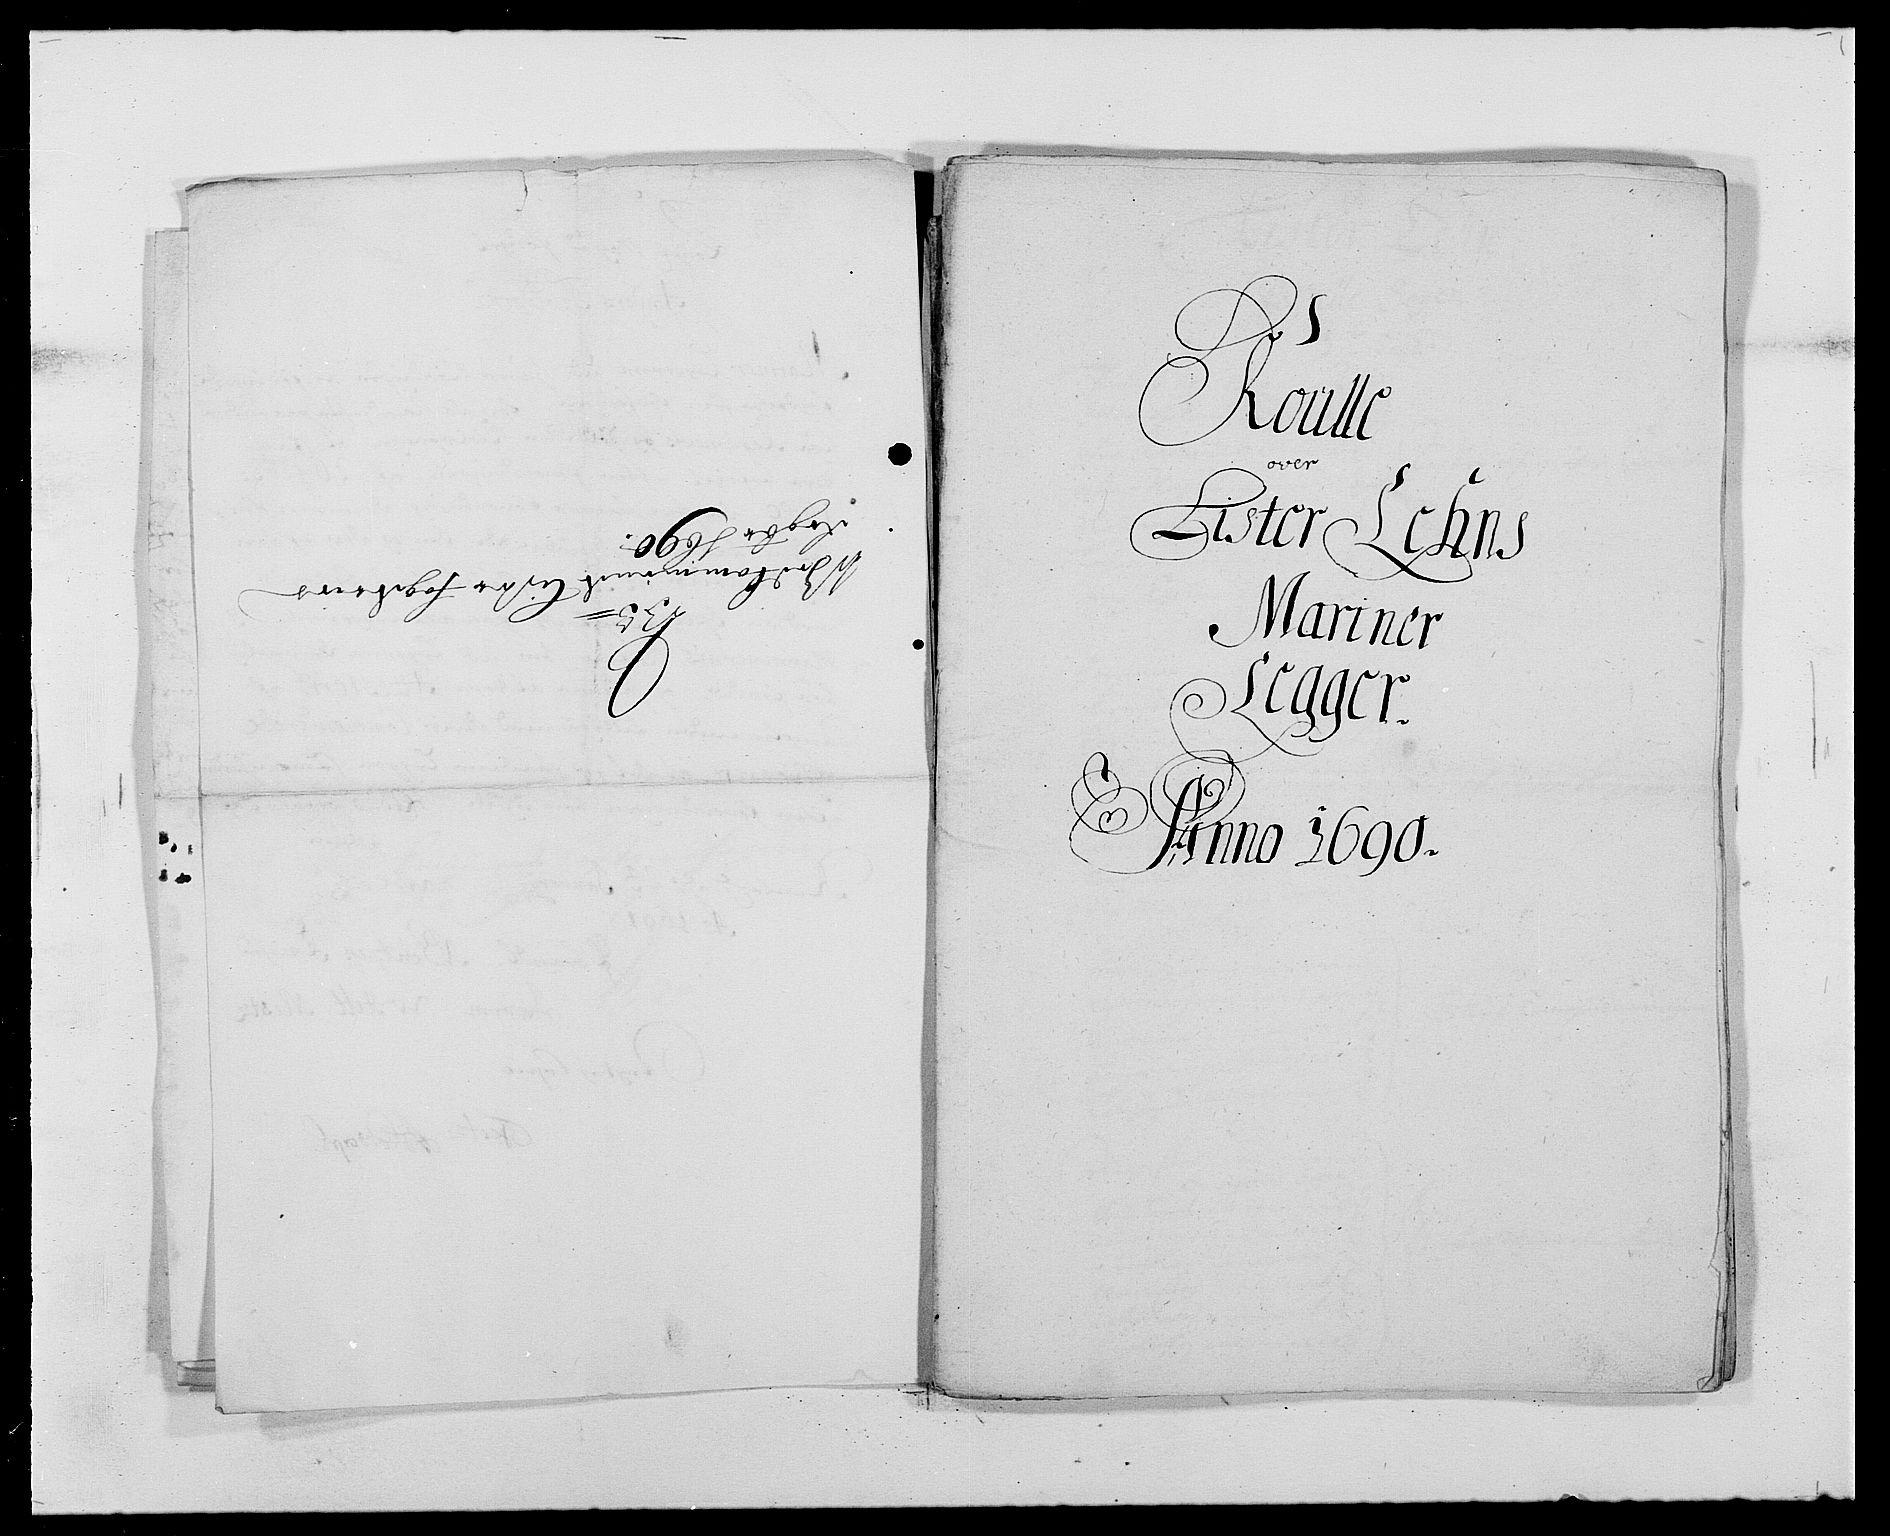 RA, Rentekammeret inntil 1814, Reviderte regnskaper, Fogderegnskap, R41/L2536: Fogderegnskap Lista, 1690-1693, s. 68